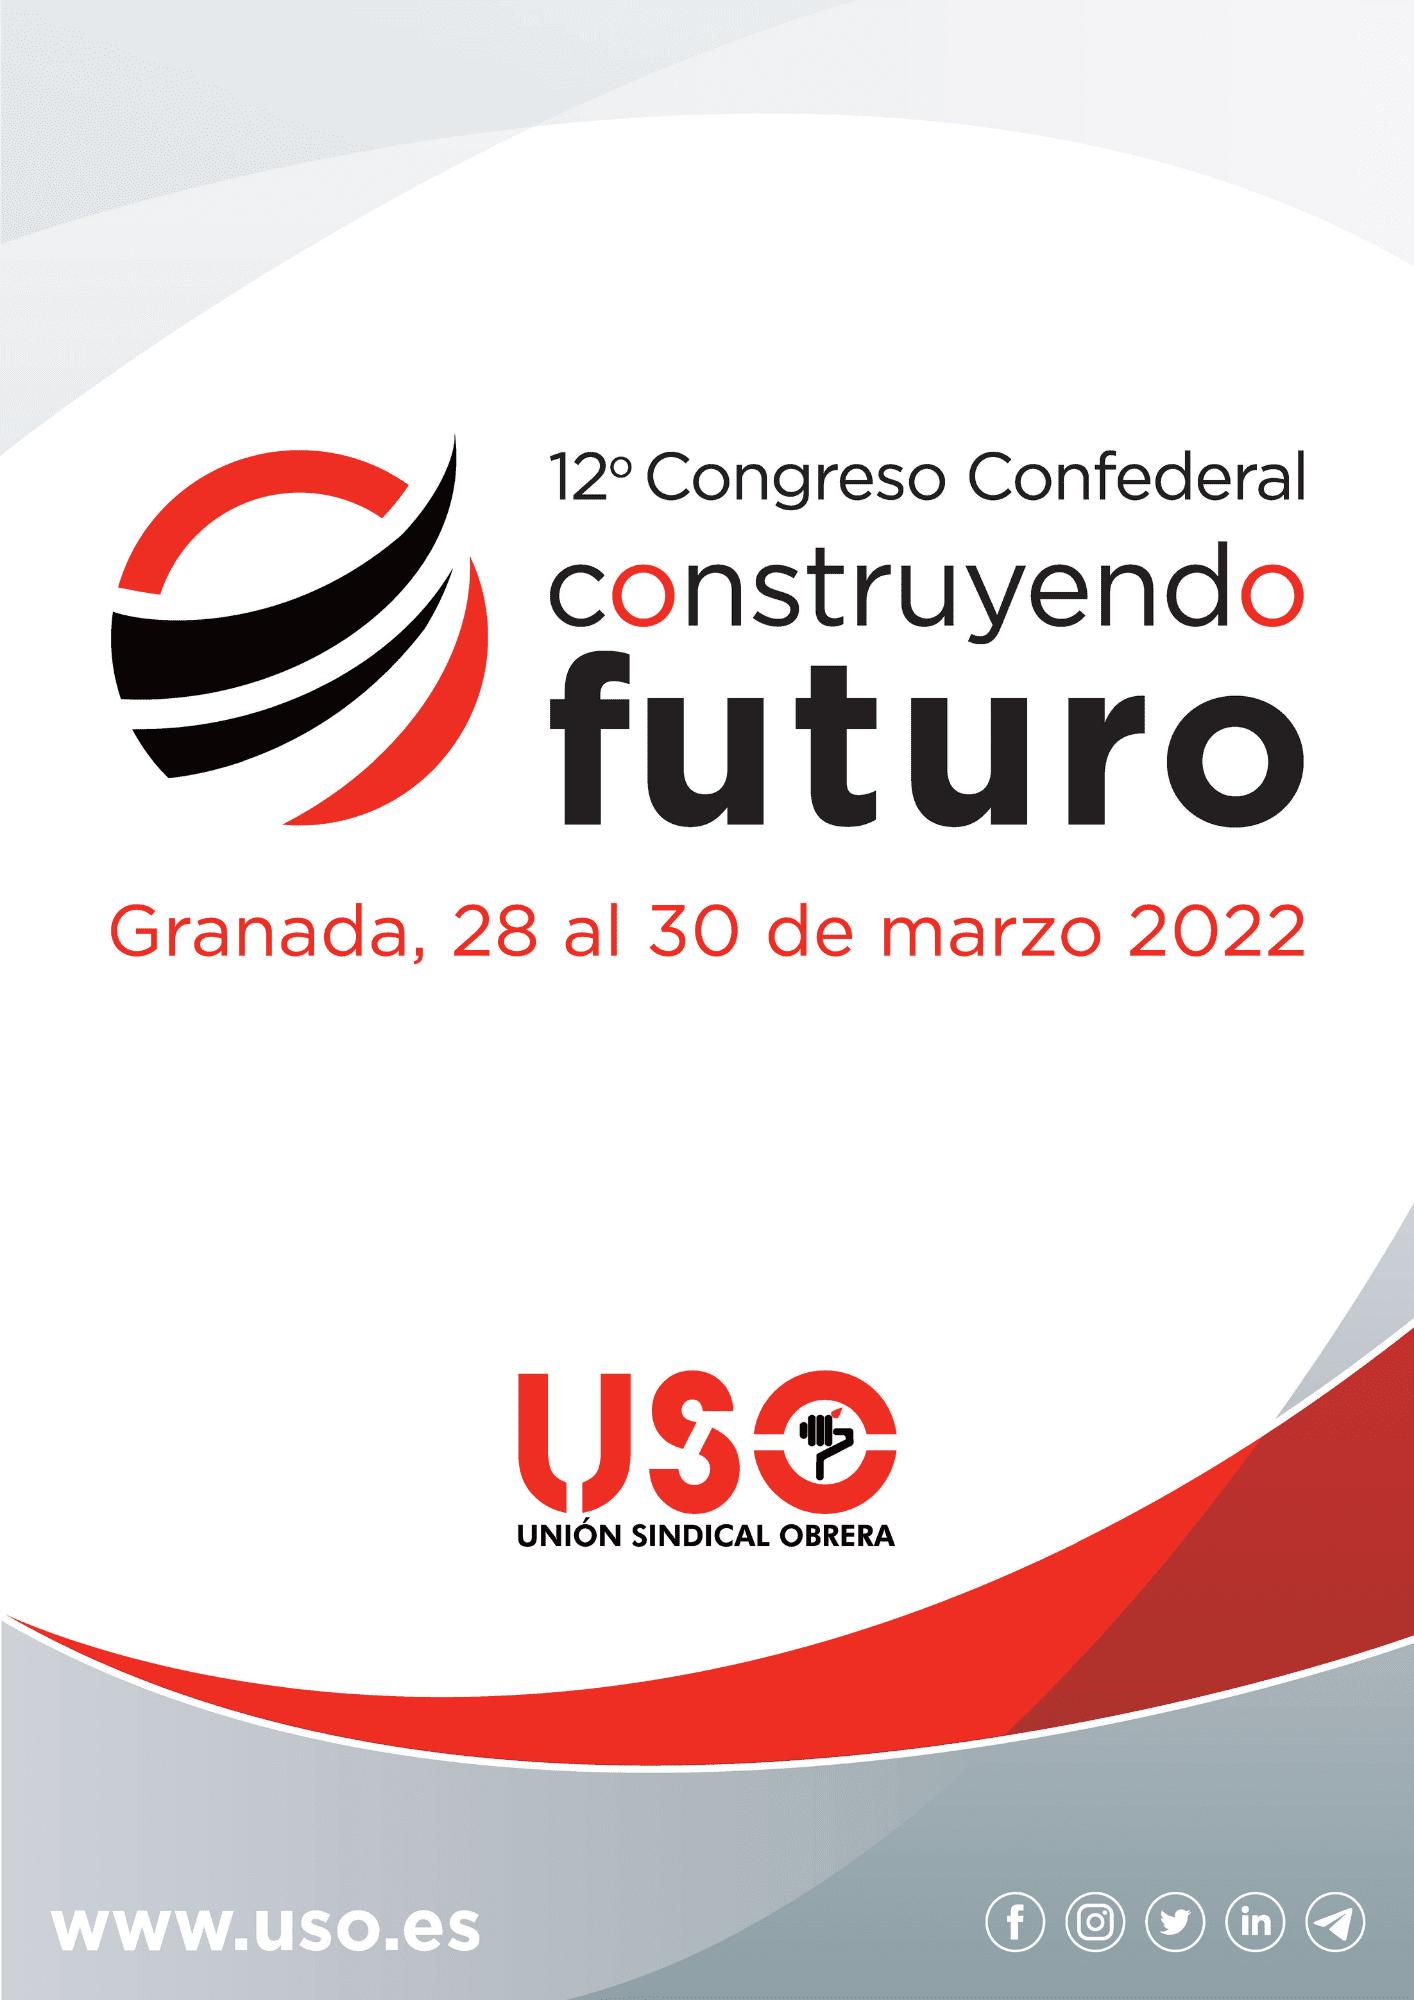 Construyendo futuro. 12º Congreso Confederal USO